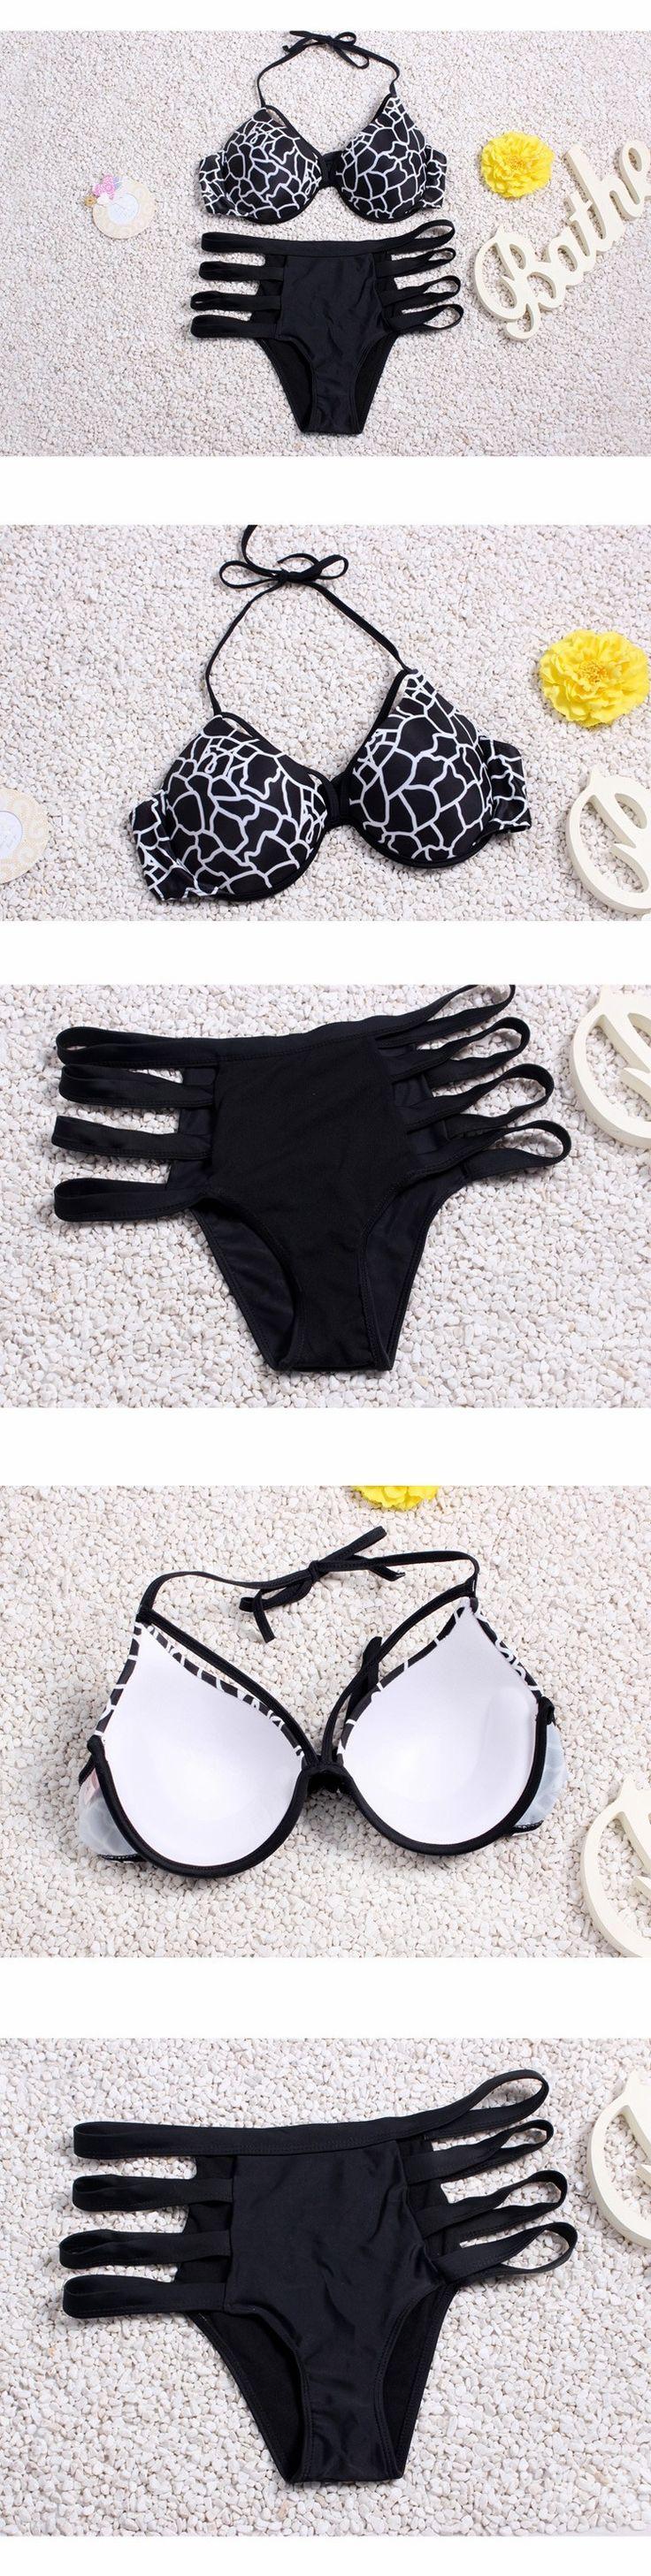 YEEL hot sale moisture proofing 4 way stretch fabric any size bikini connectors